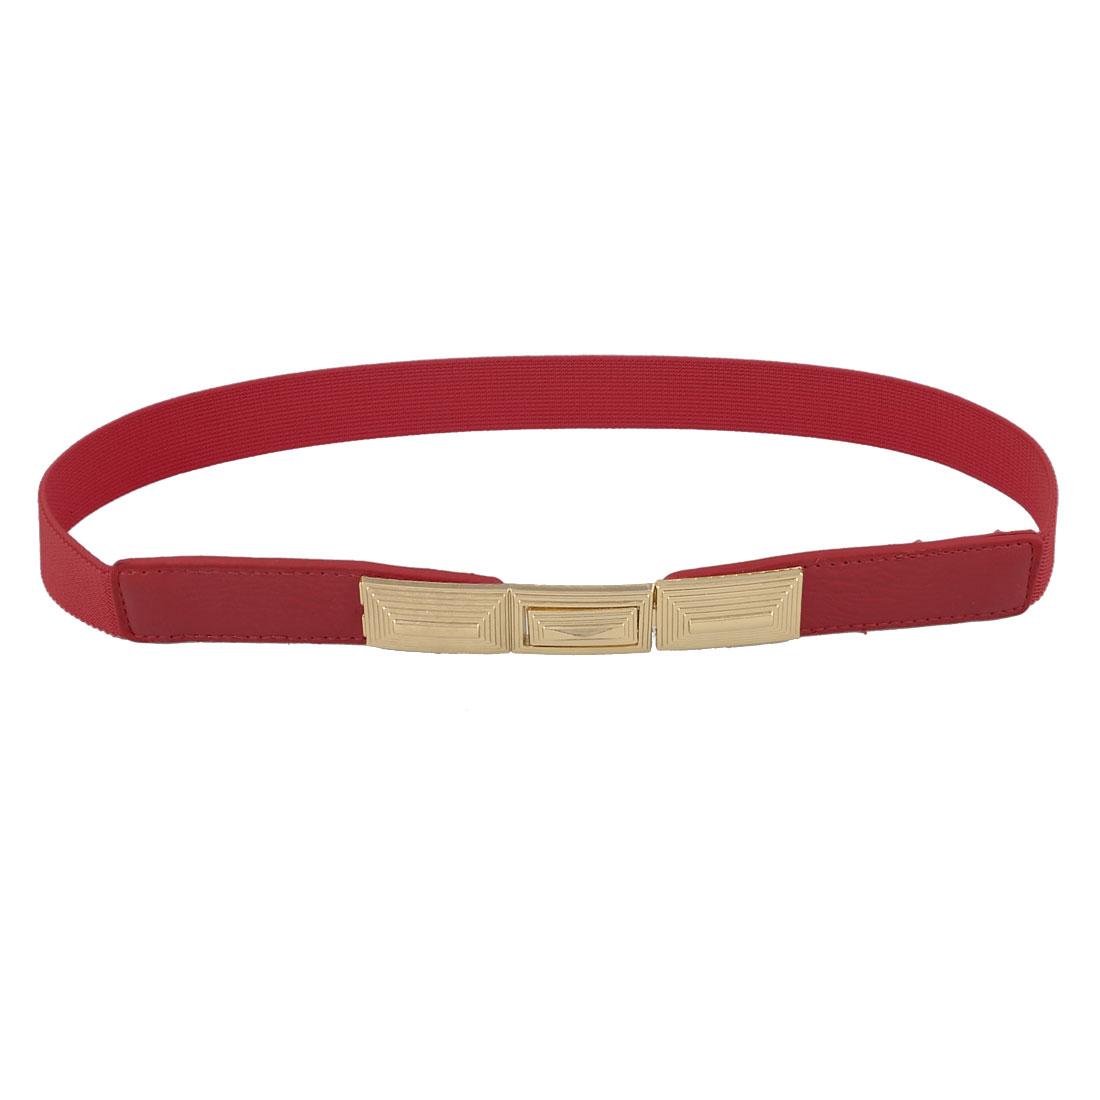 Lady Gold Tone Metal Interlocking Buckle Red Skinny Stretch Waistband Belt